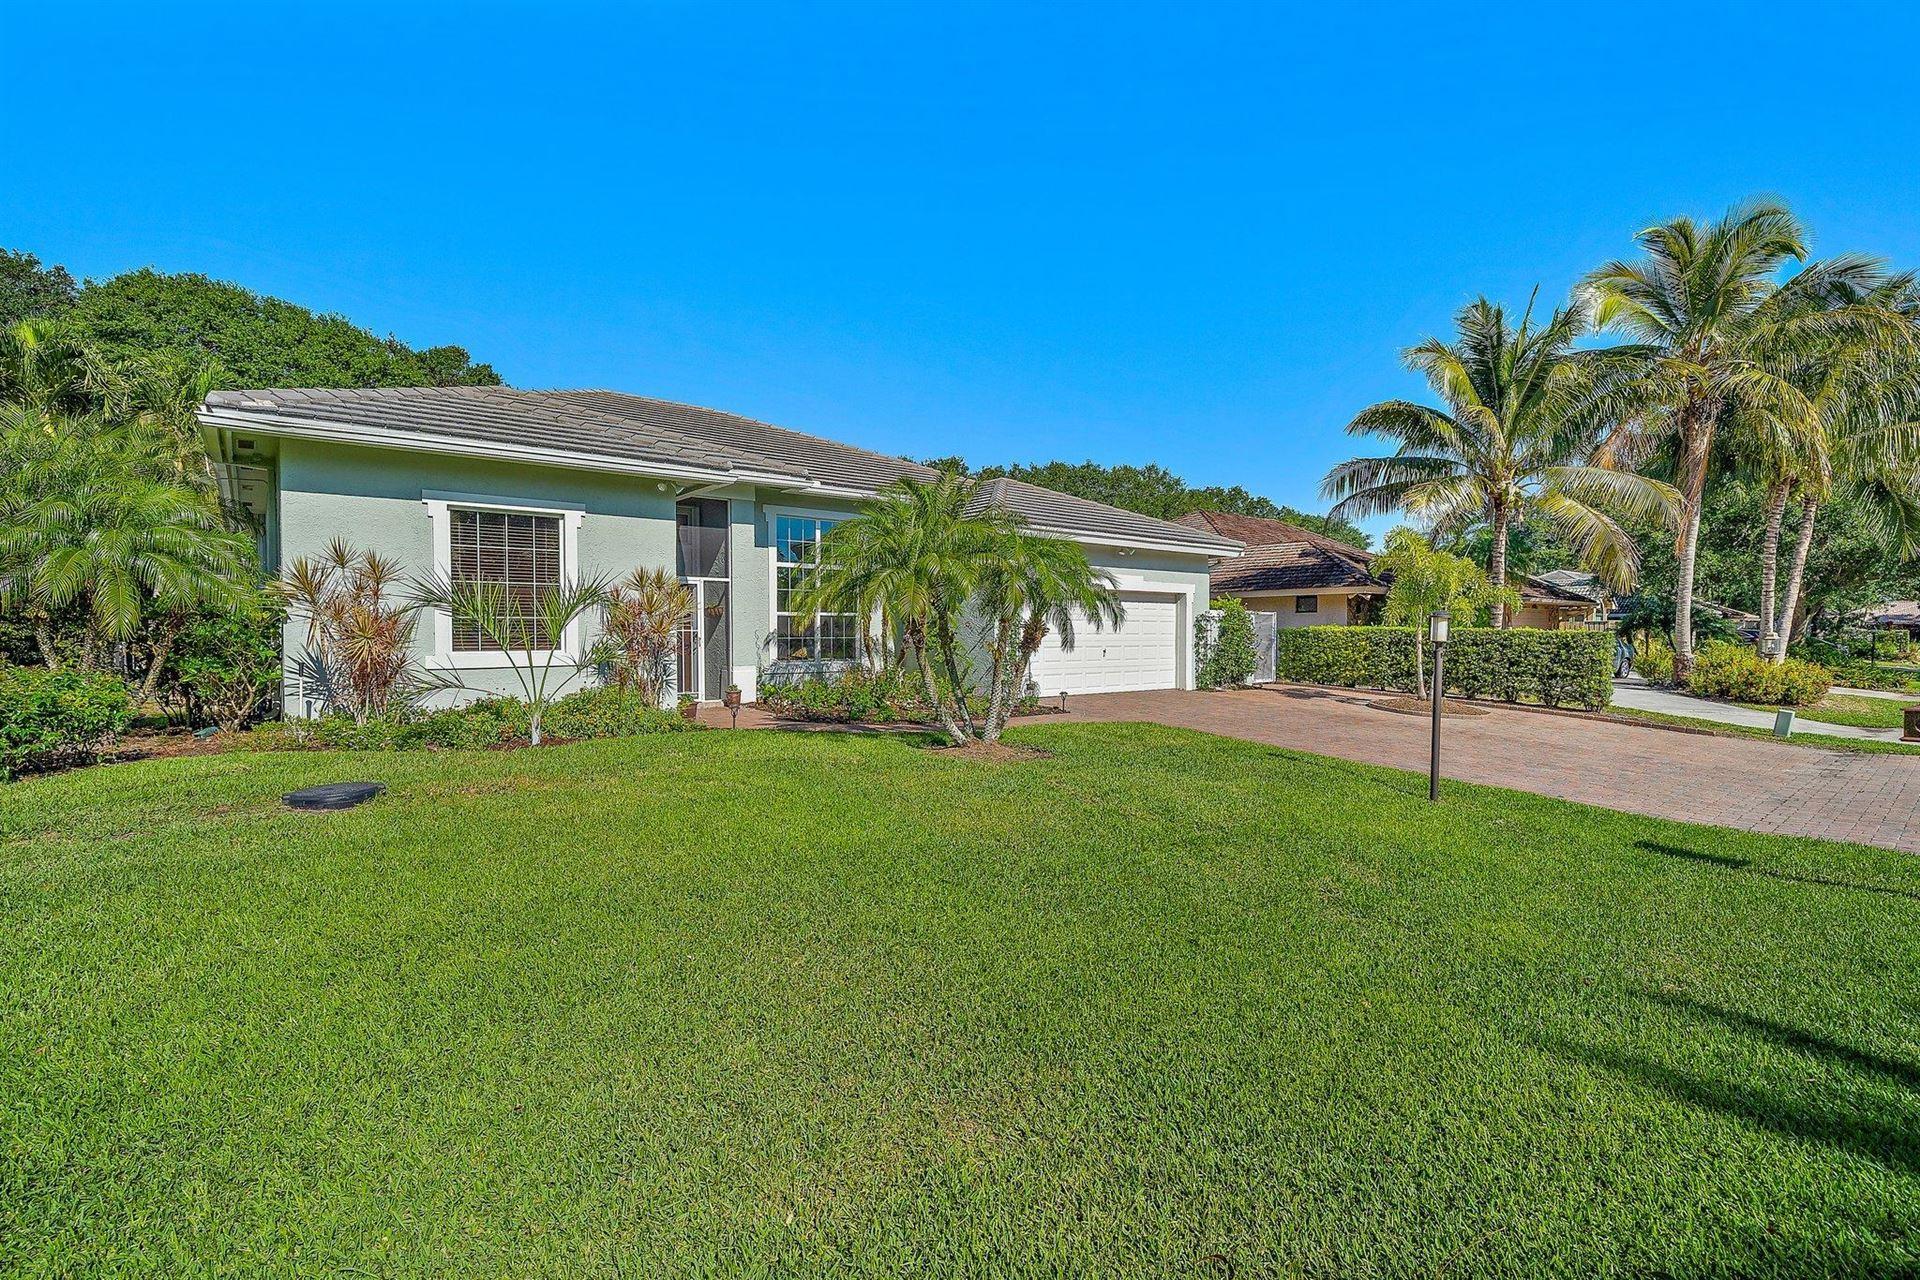 5025 Whispering Hollow, Palm Beach Gardens, FL 33418 - #: RX-10708176